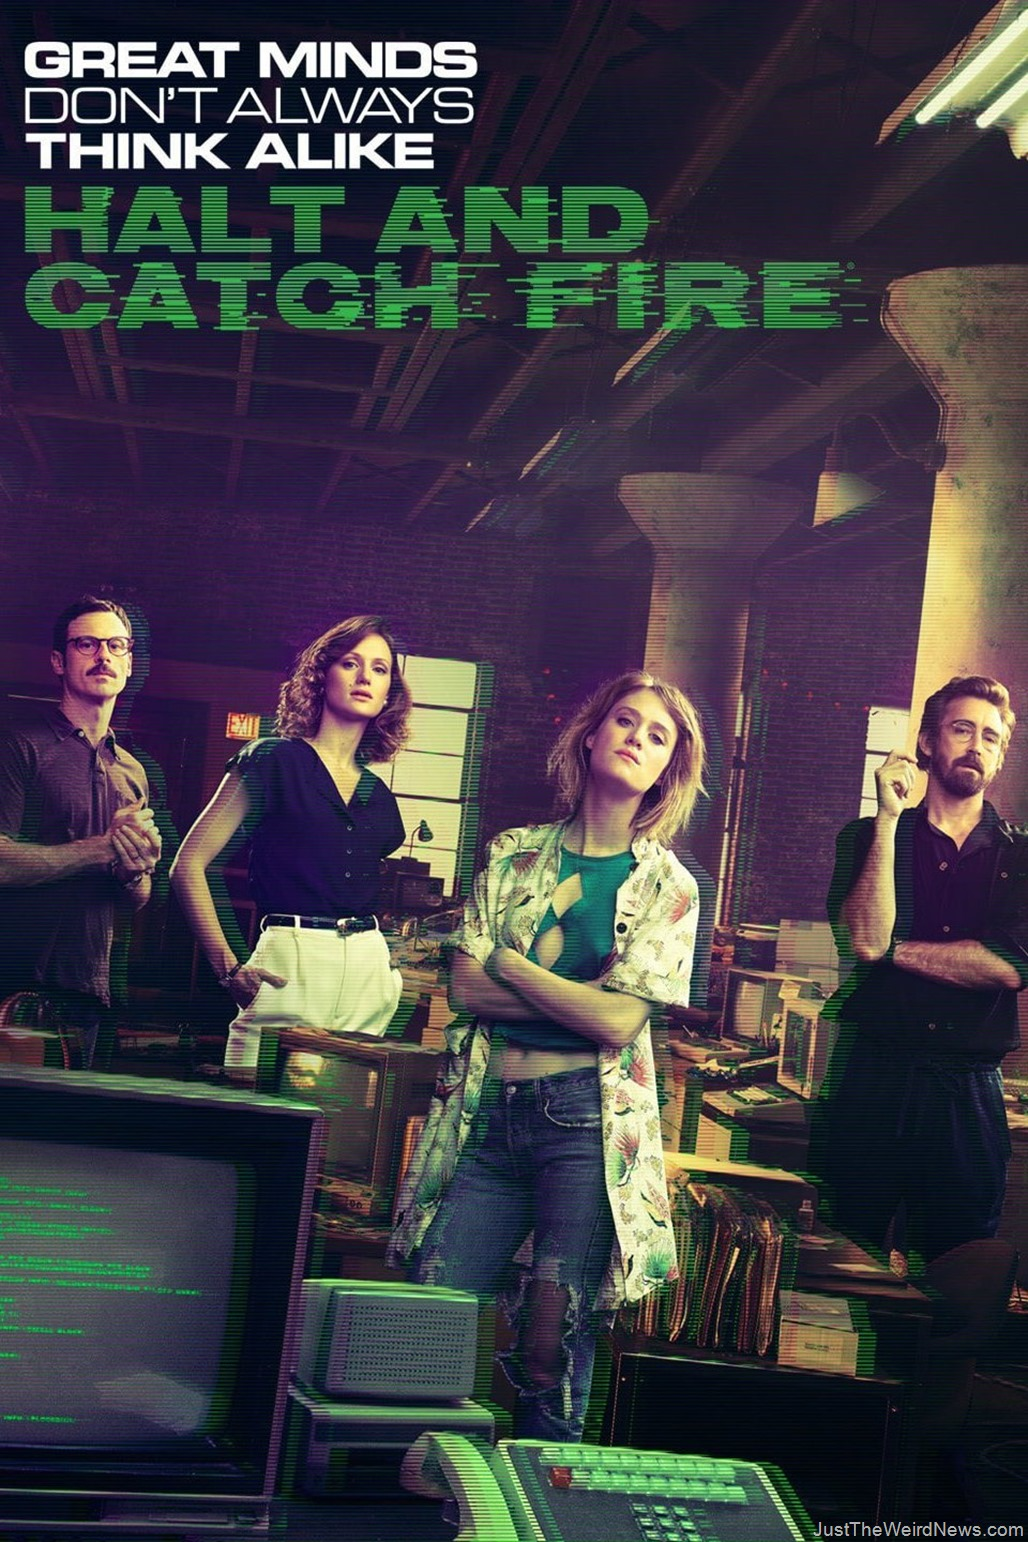 Halt-and-Catch-Fire-Sesason-3-Promo-Poster_thumb